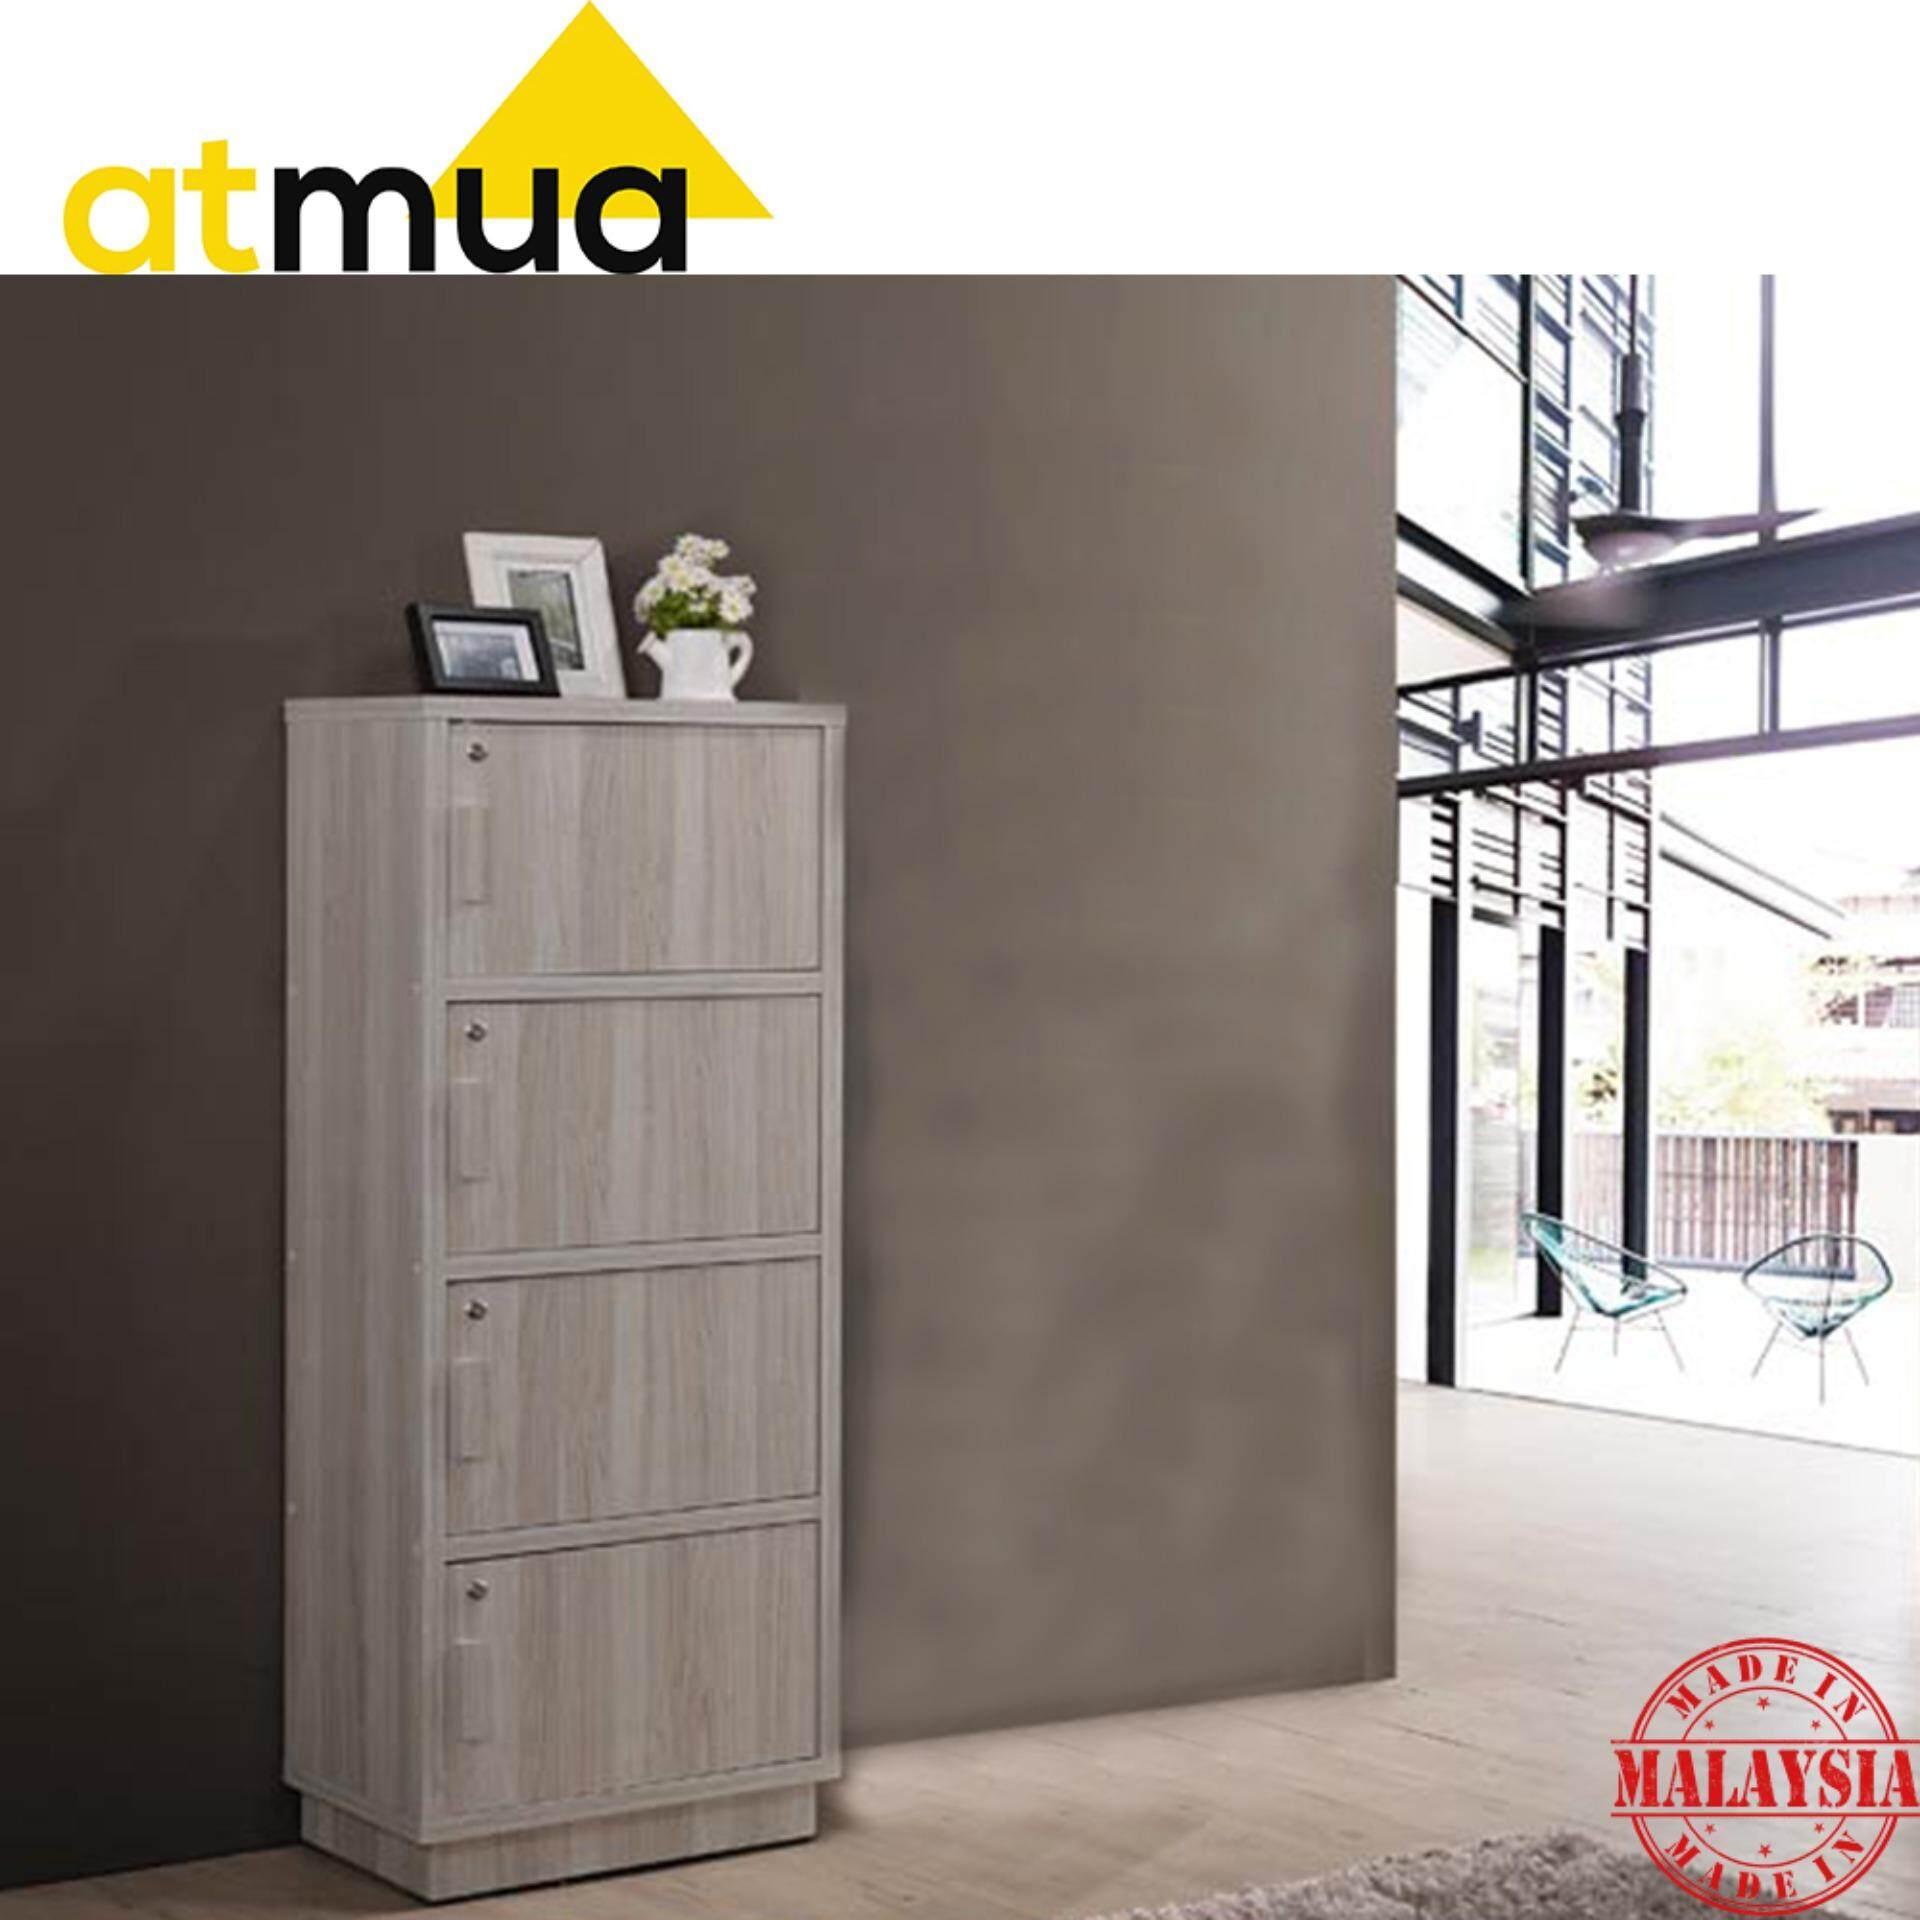 Atmua Chee Storage Cabinet with Lock - 4 Door Locker [Hollow MDF Board]